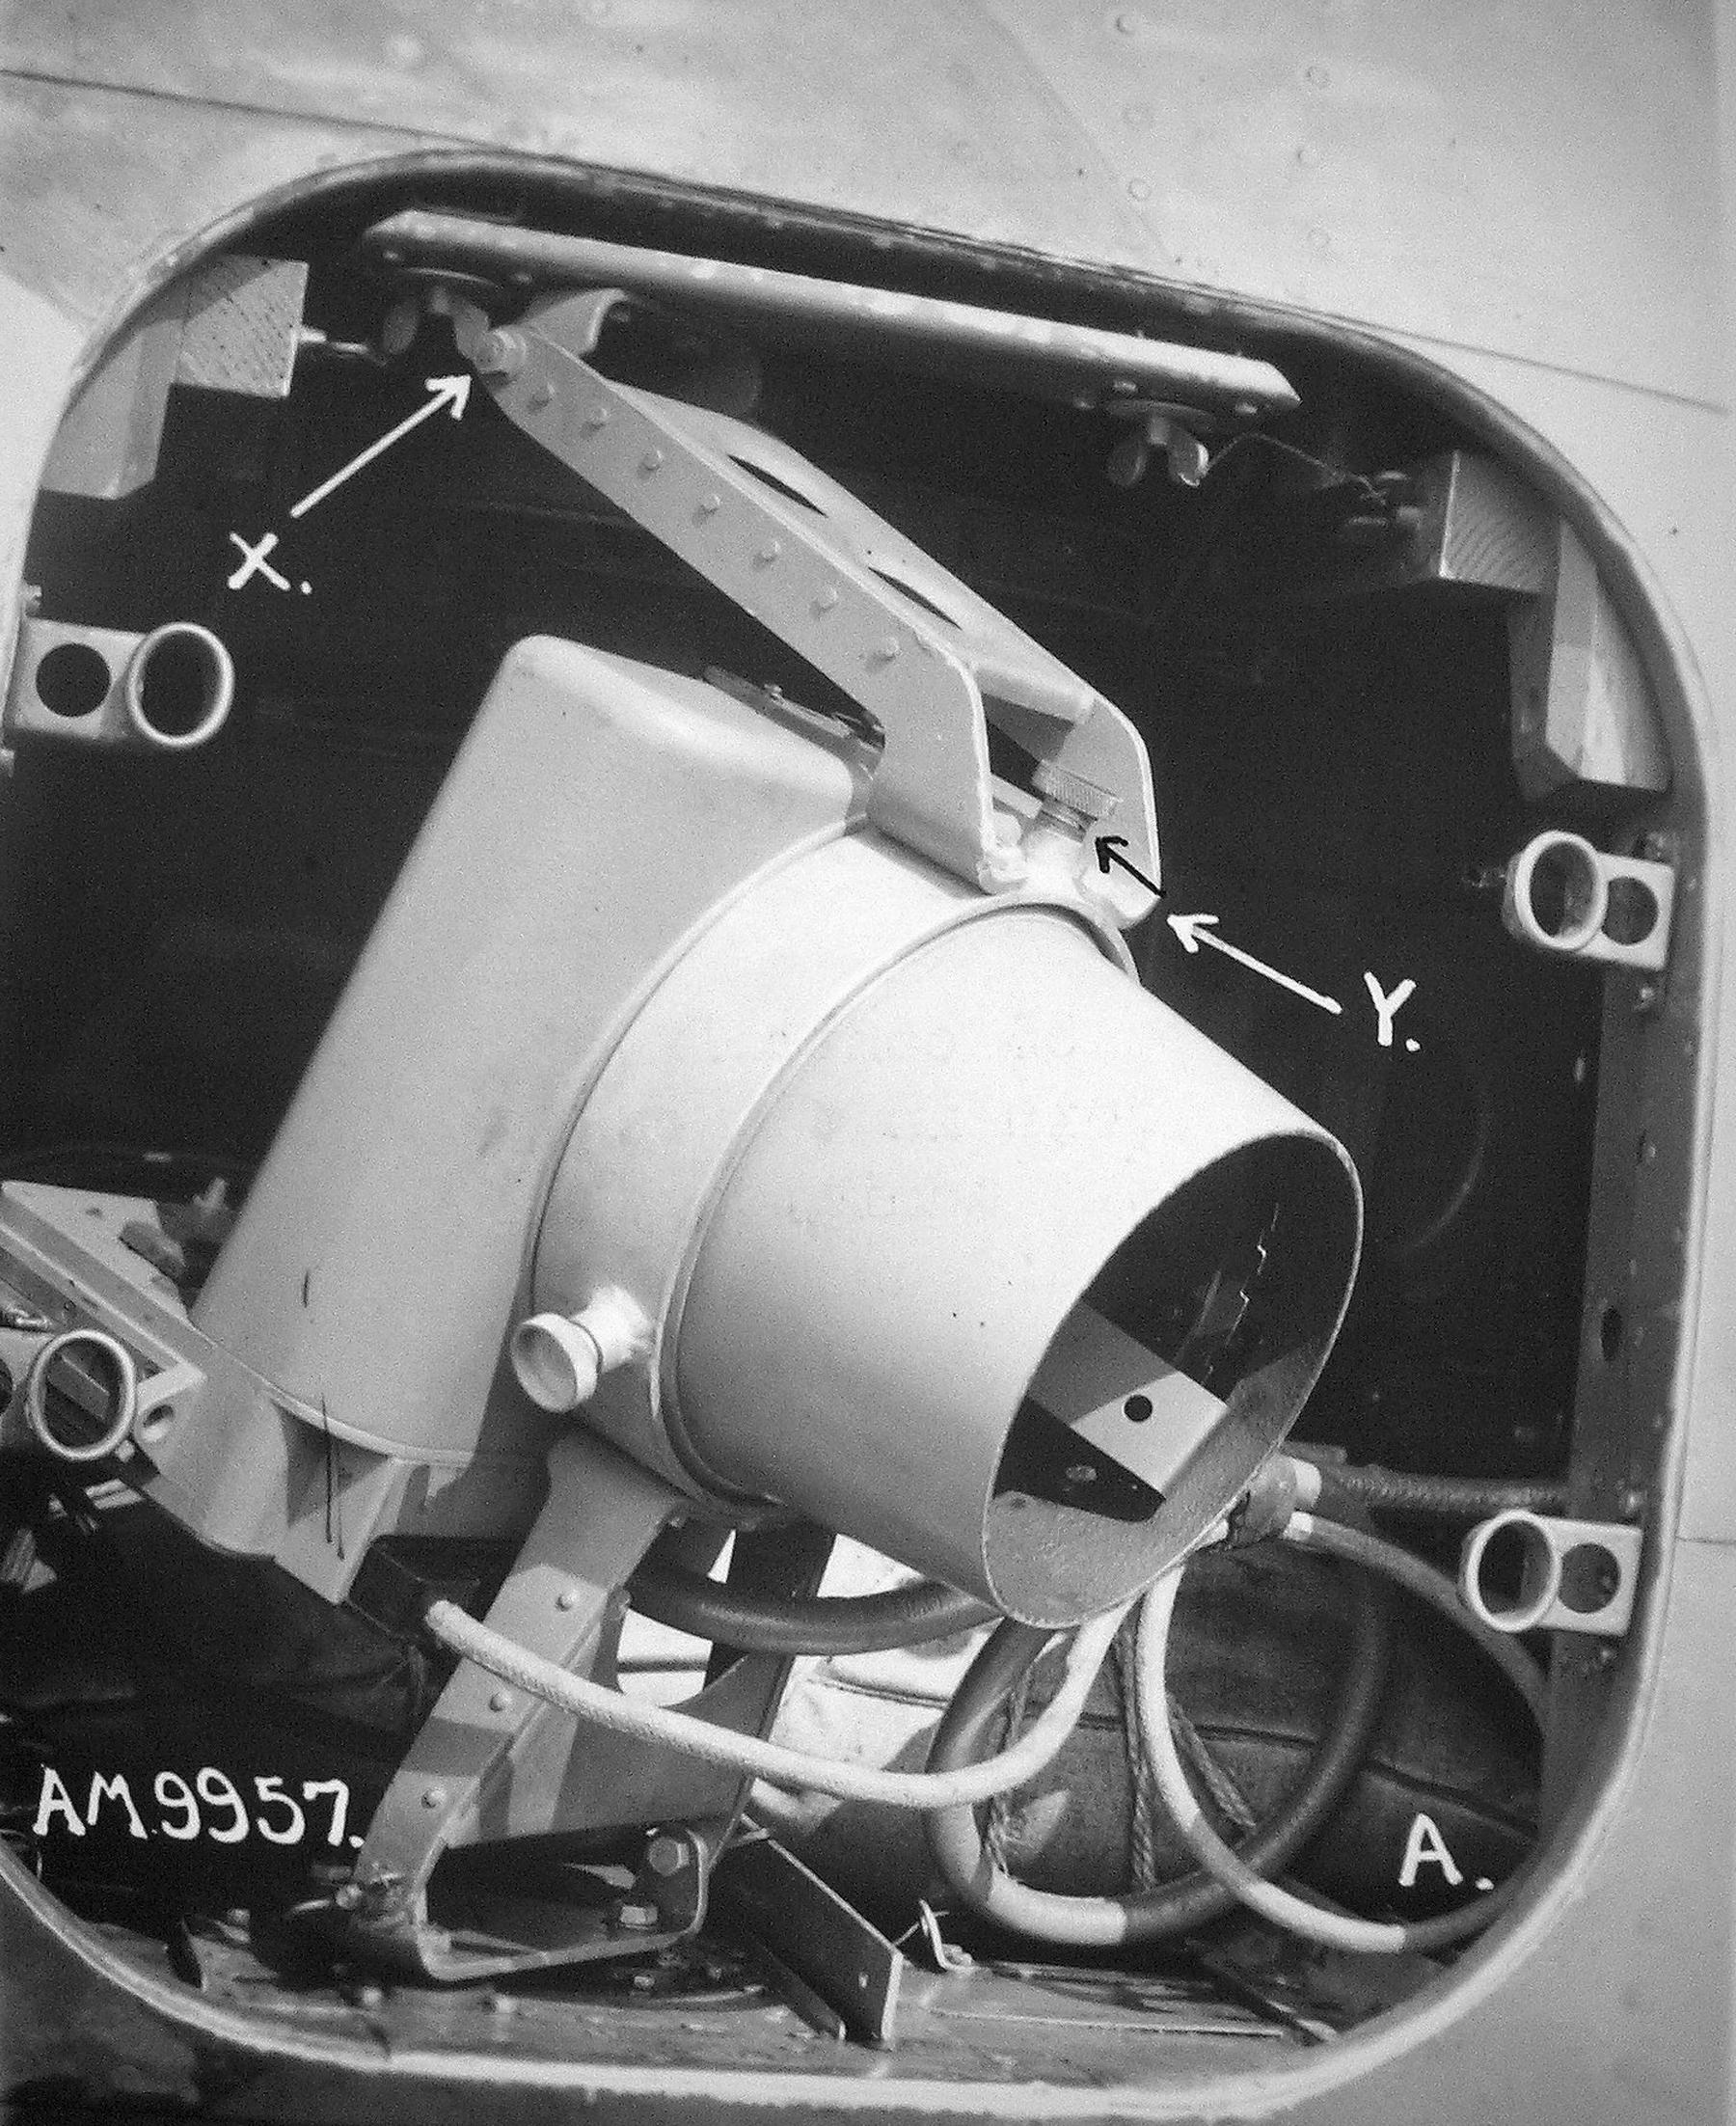 Tomahawk_Camera_set_up_TACR_work___NA_UK[1].jpg